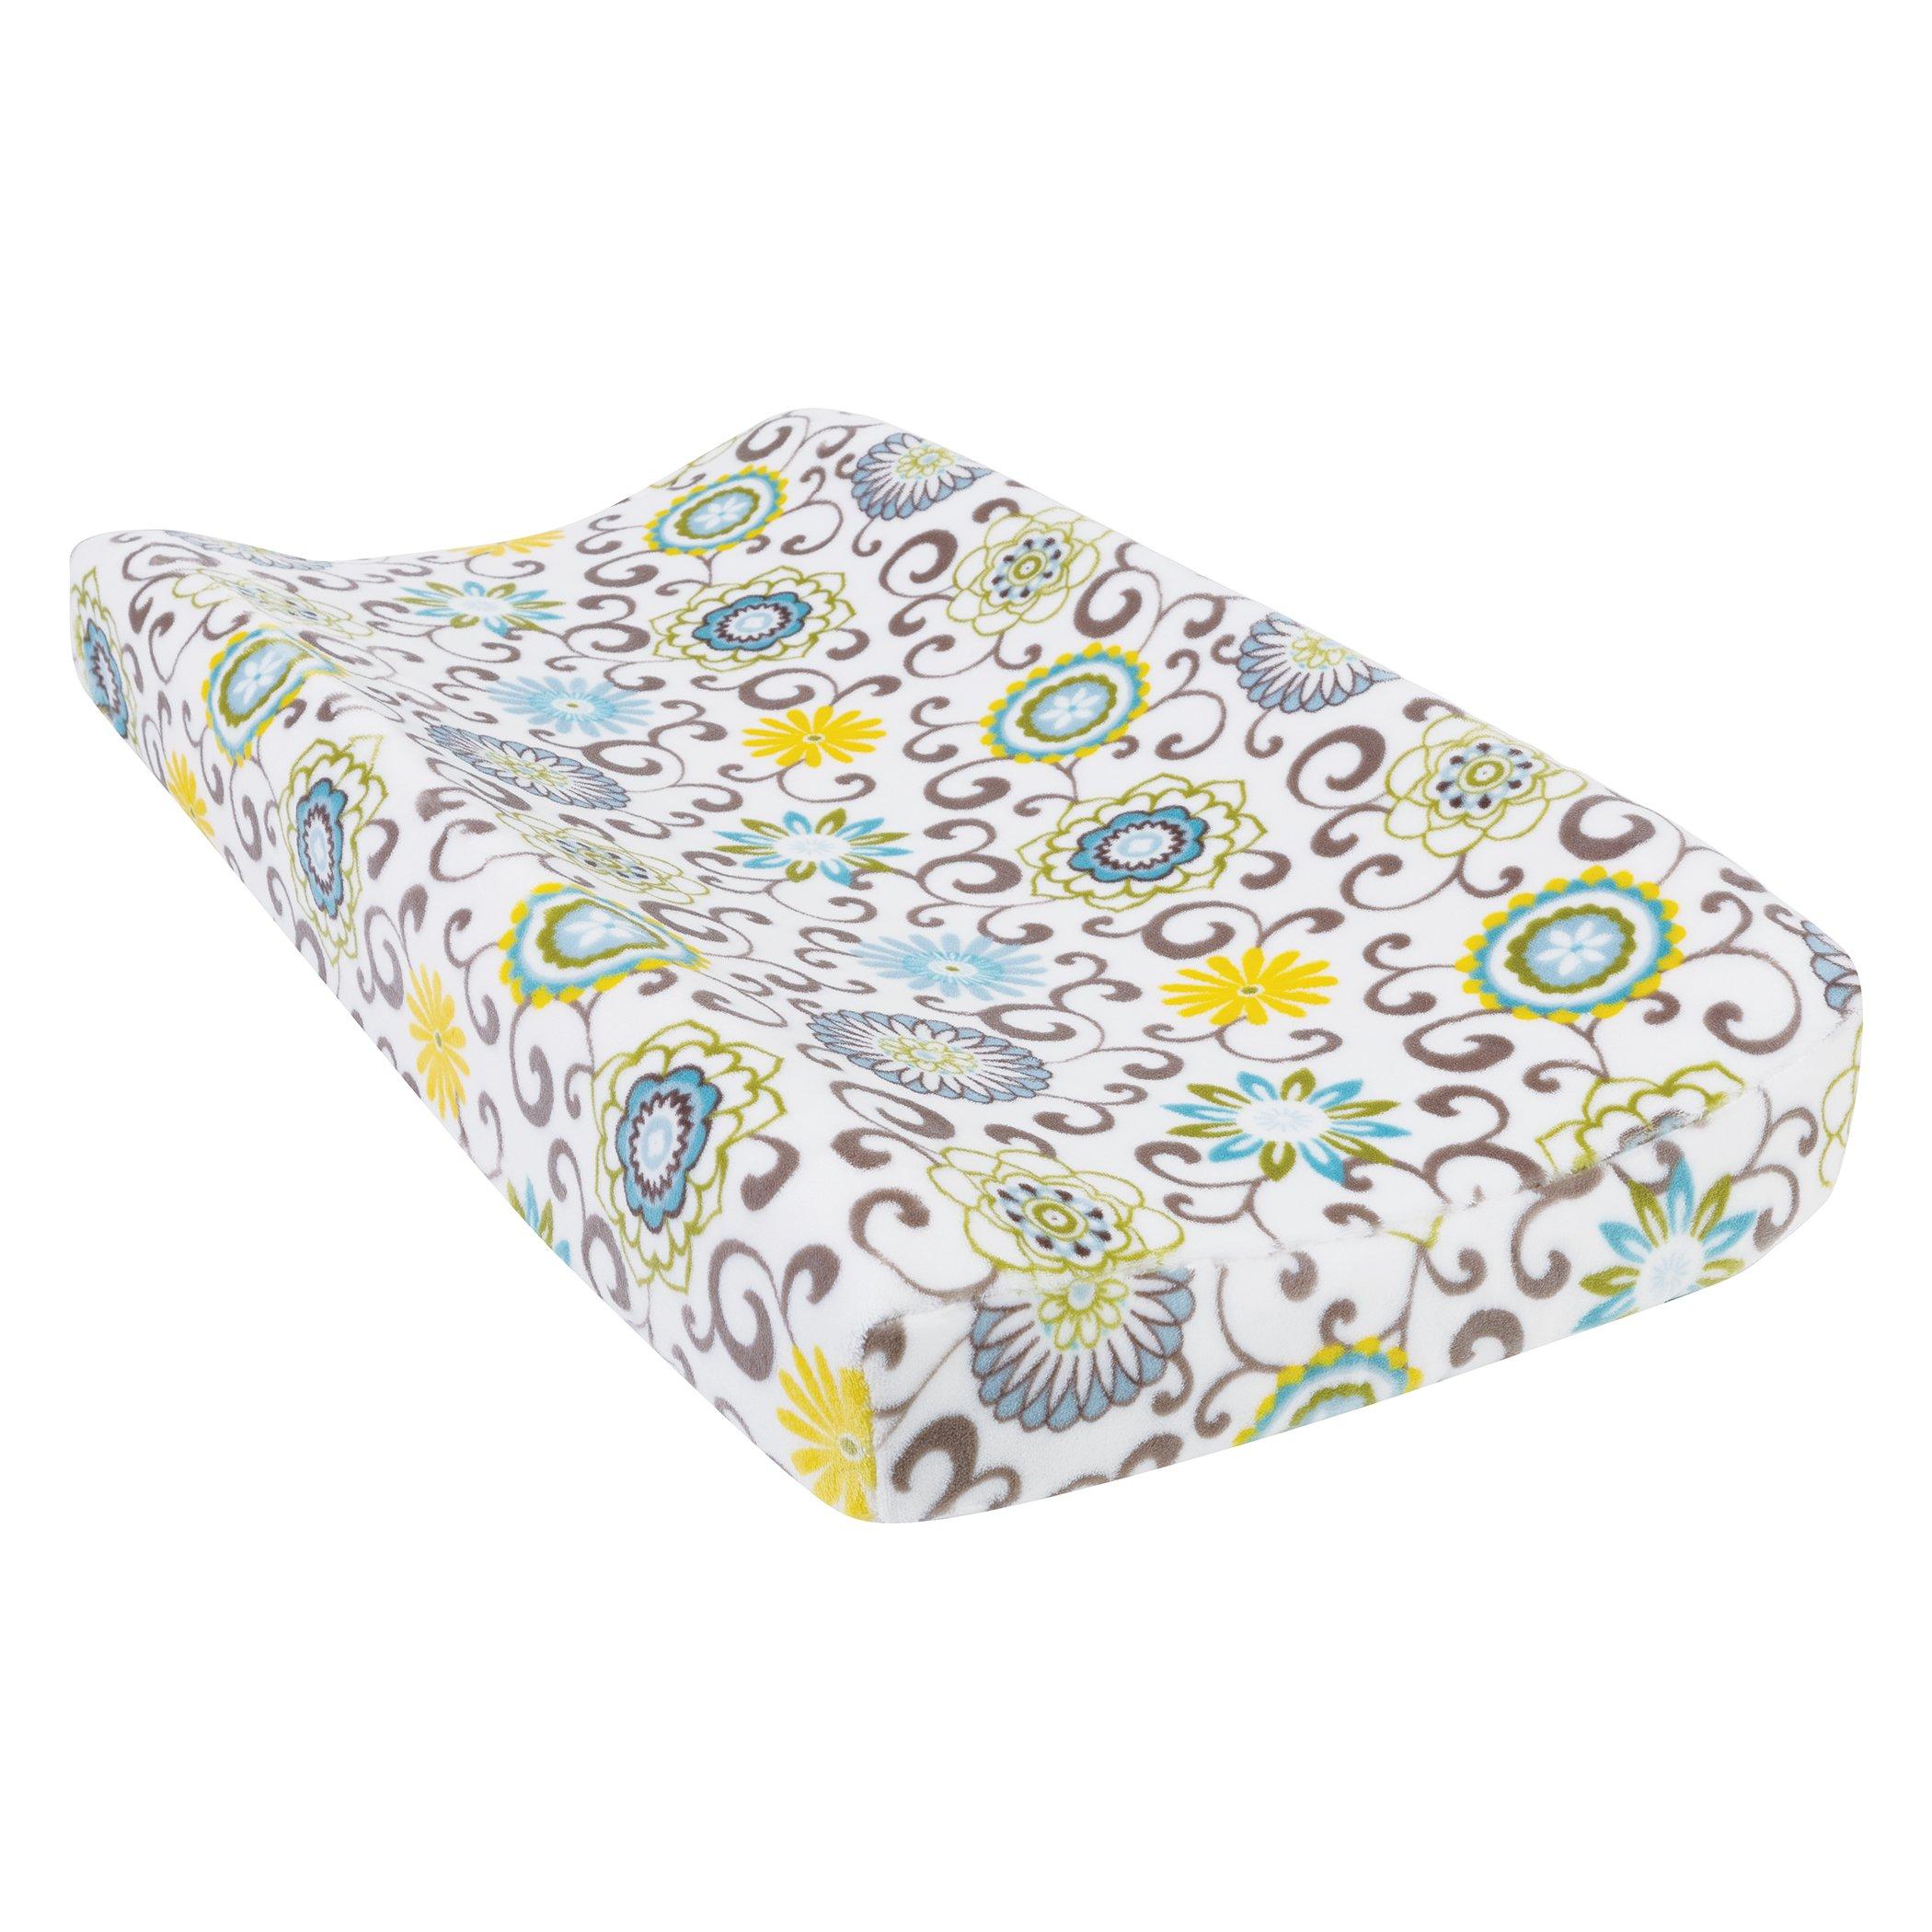 Trend Lab Plush Changing Pad Cover, Multi Waverly Pom Pom Spa